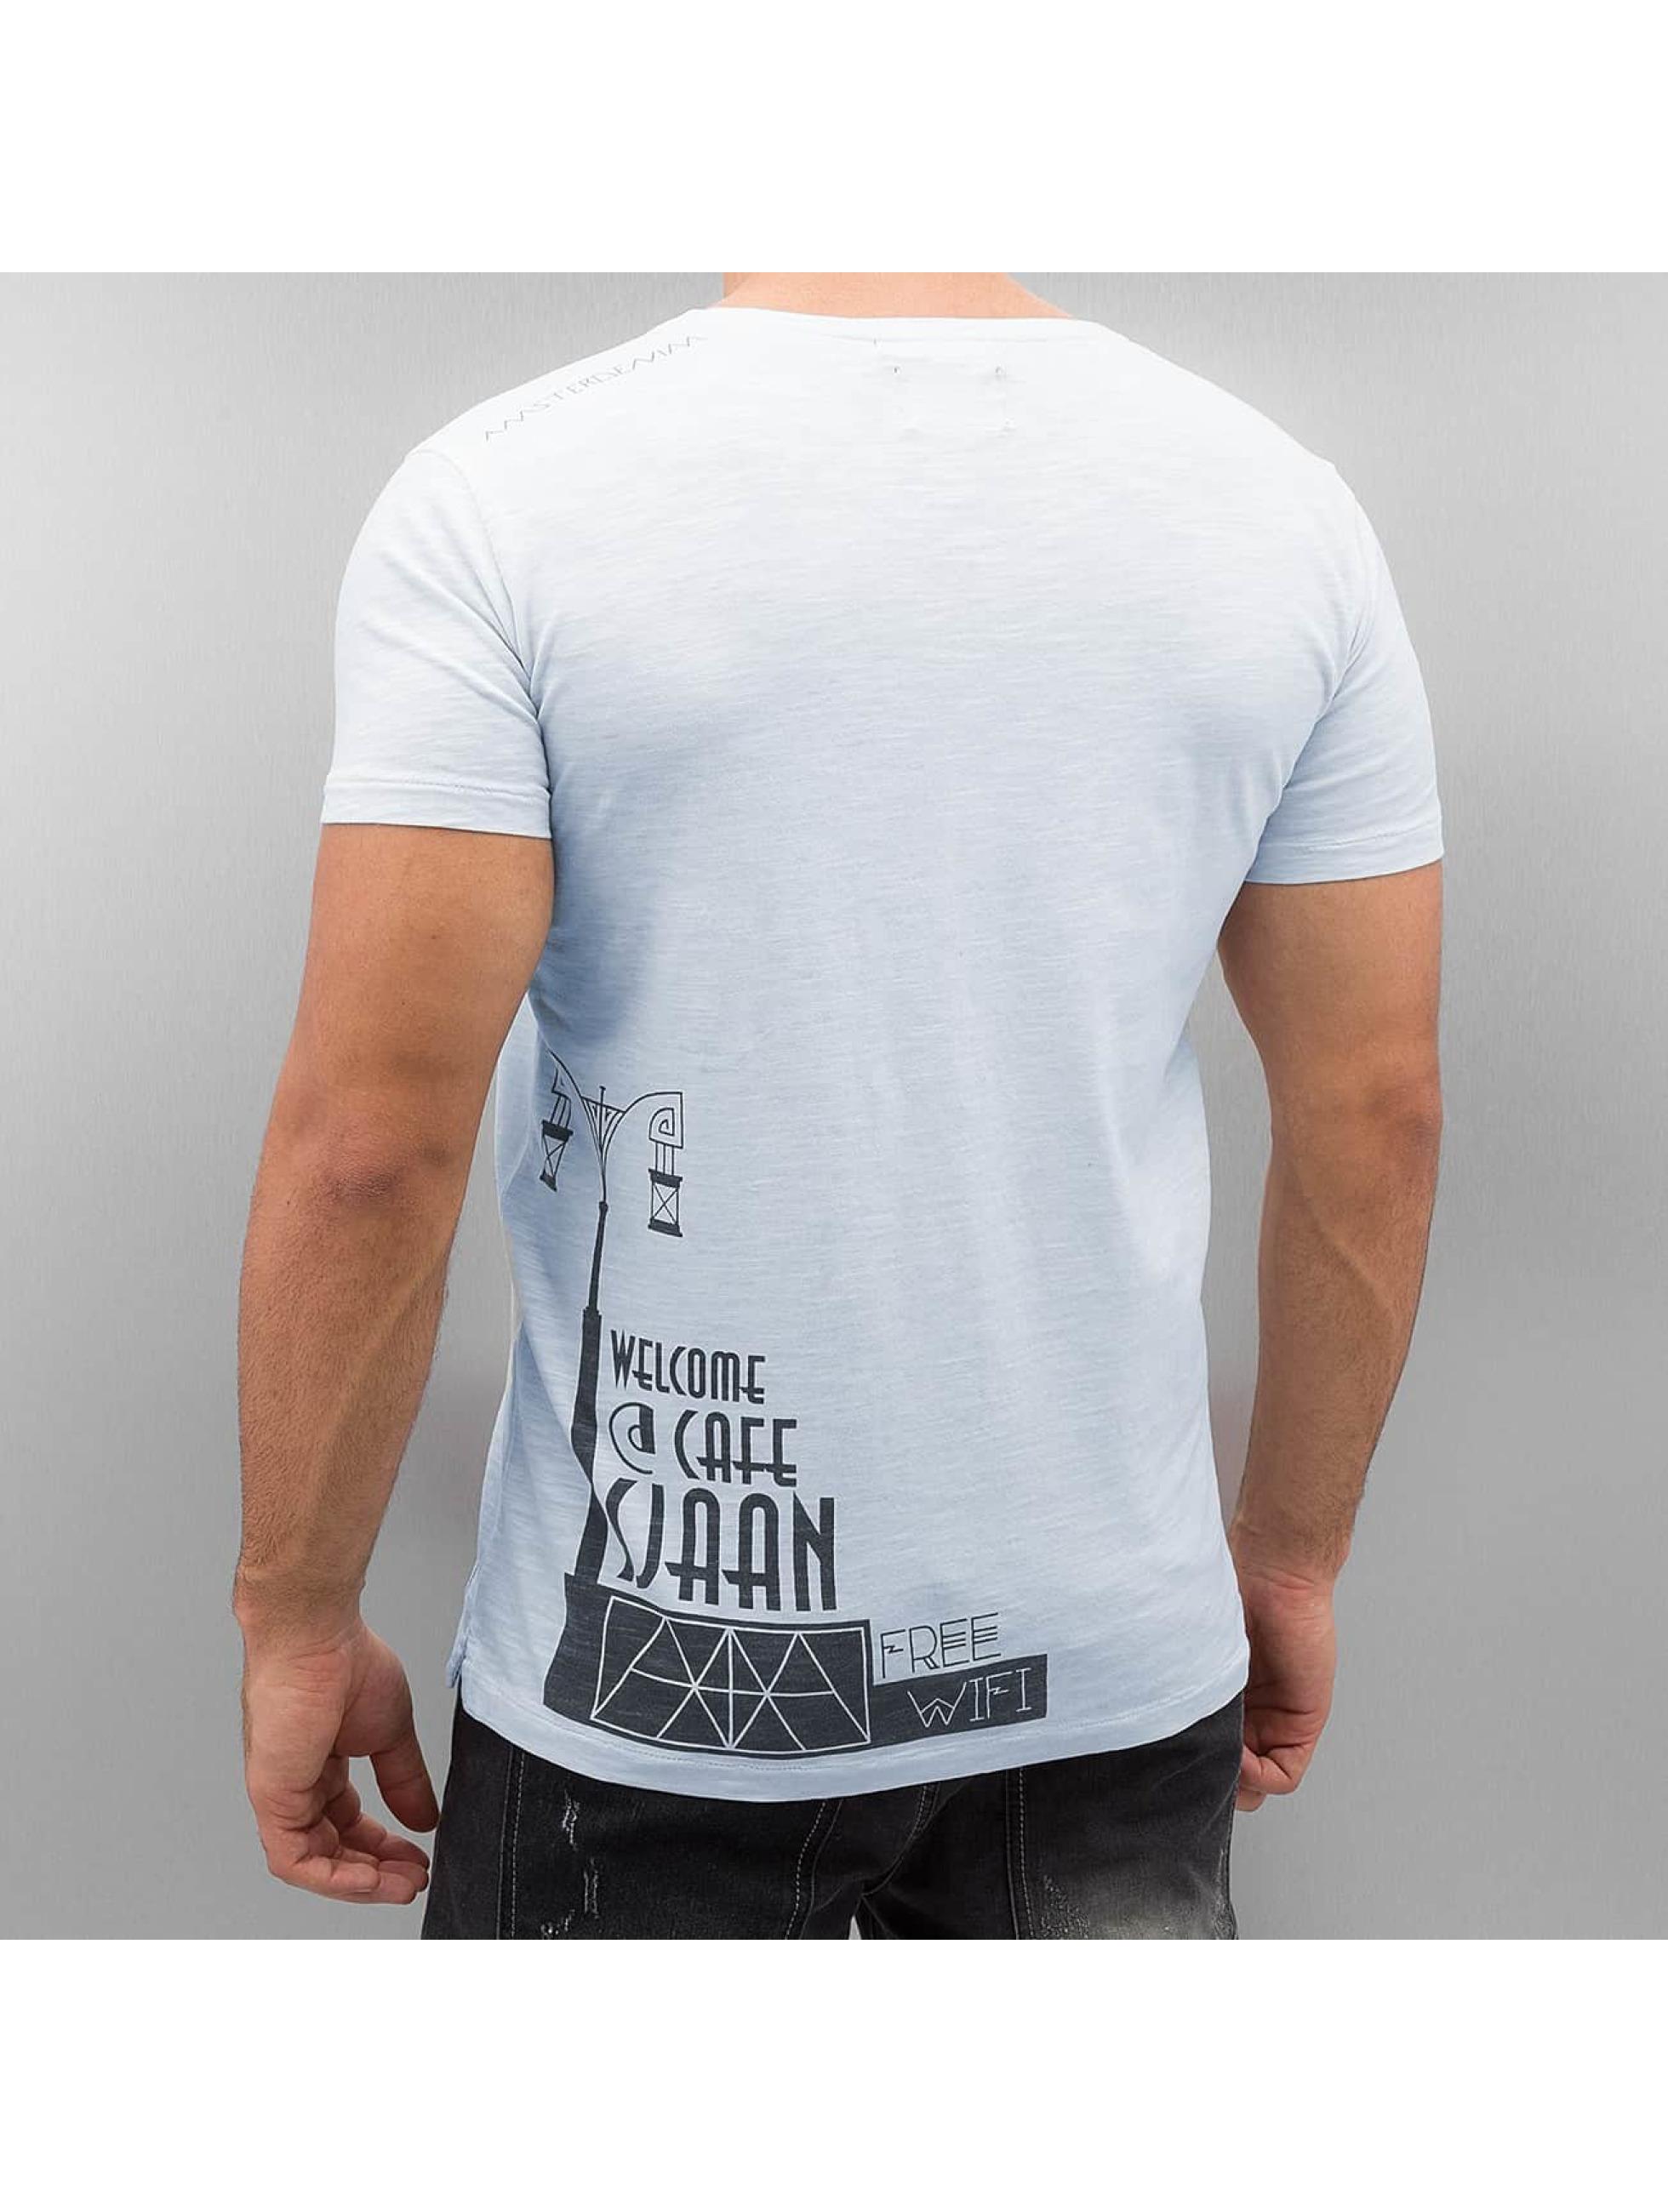 Amsterdenim T-shirt Tommy Sjaan blu